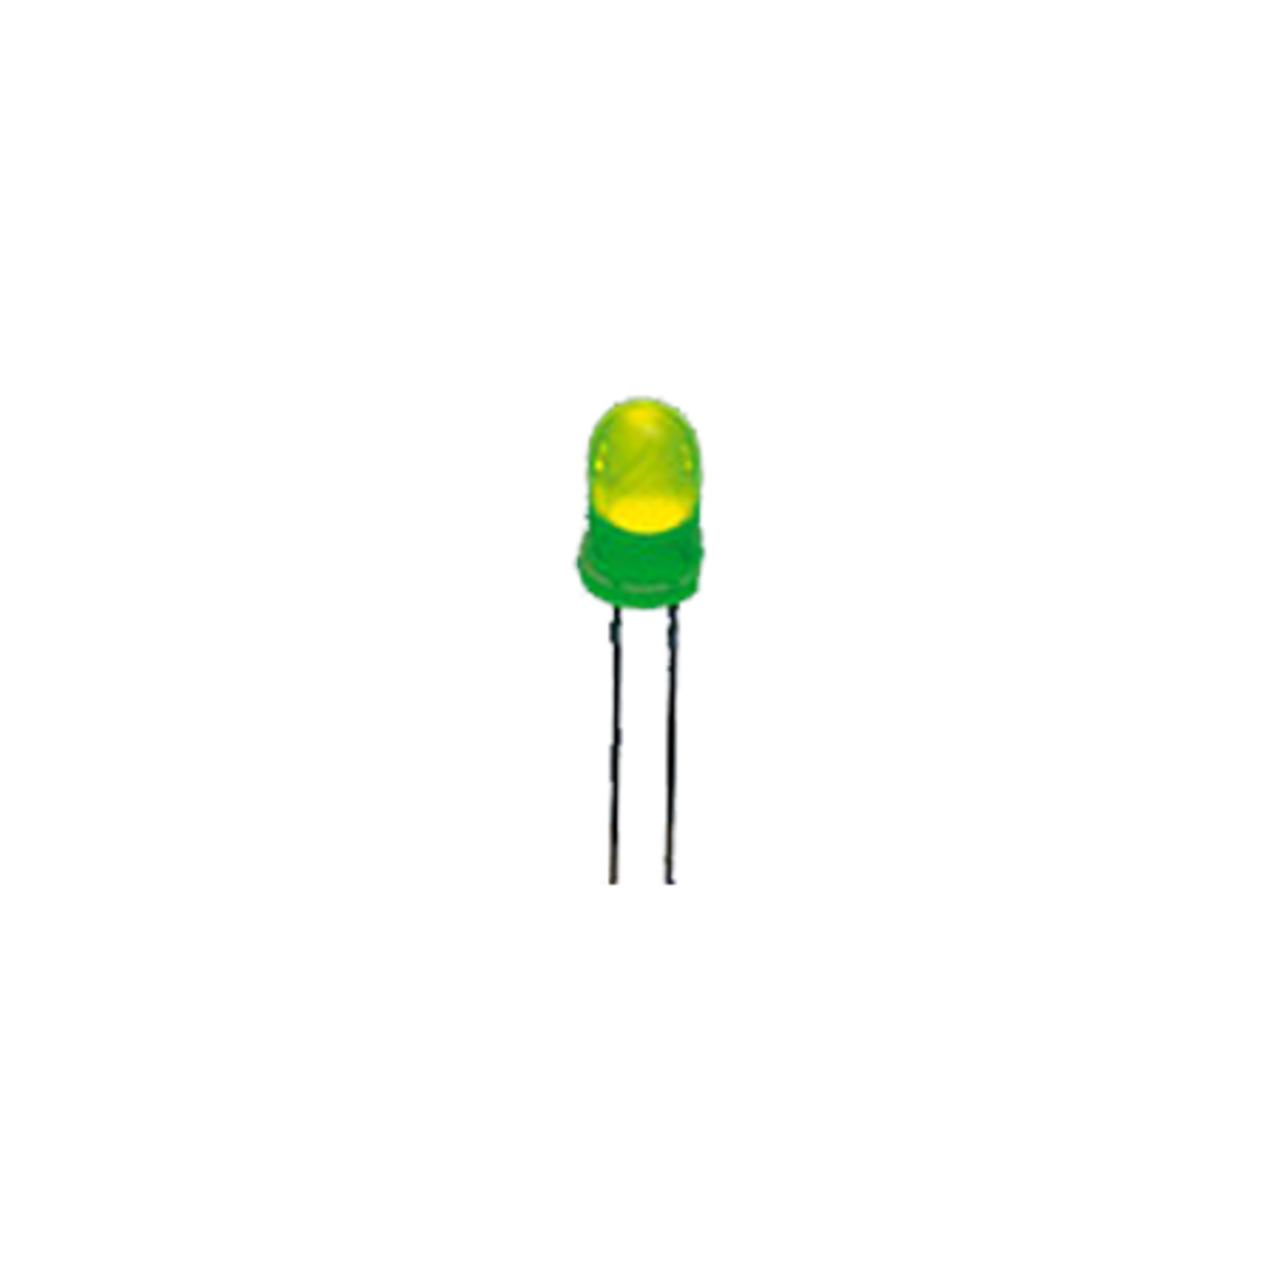 Superhelle 3 mm LED- Grün- 6-500 mcd- 10er-Pack